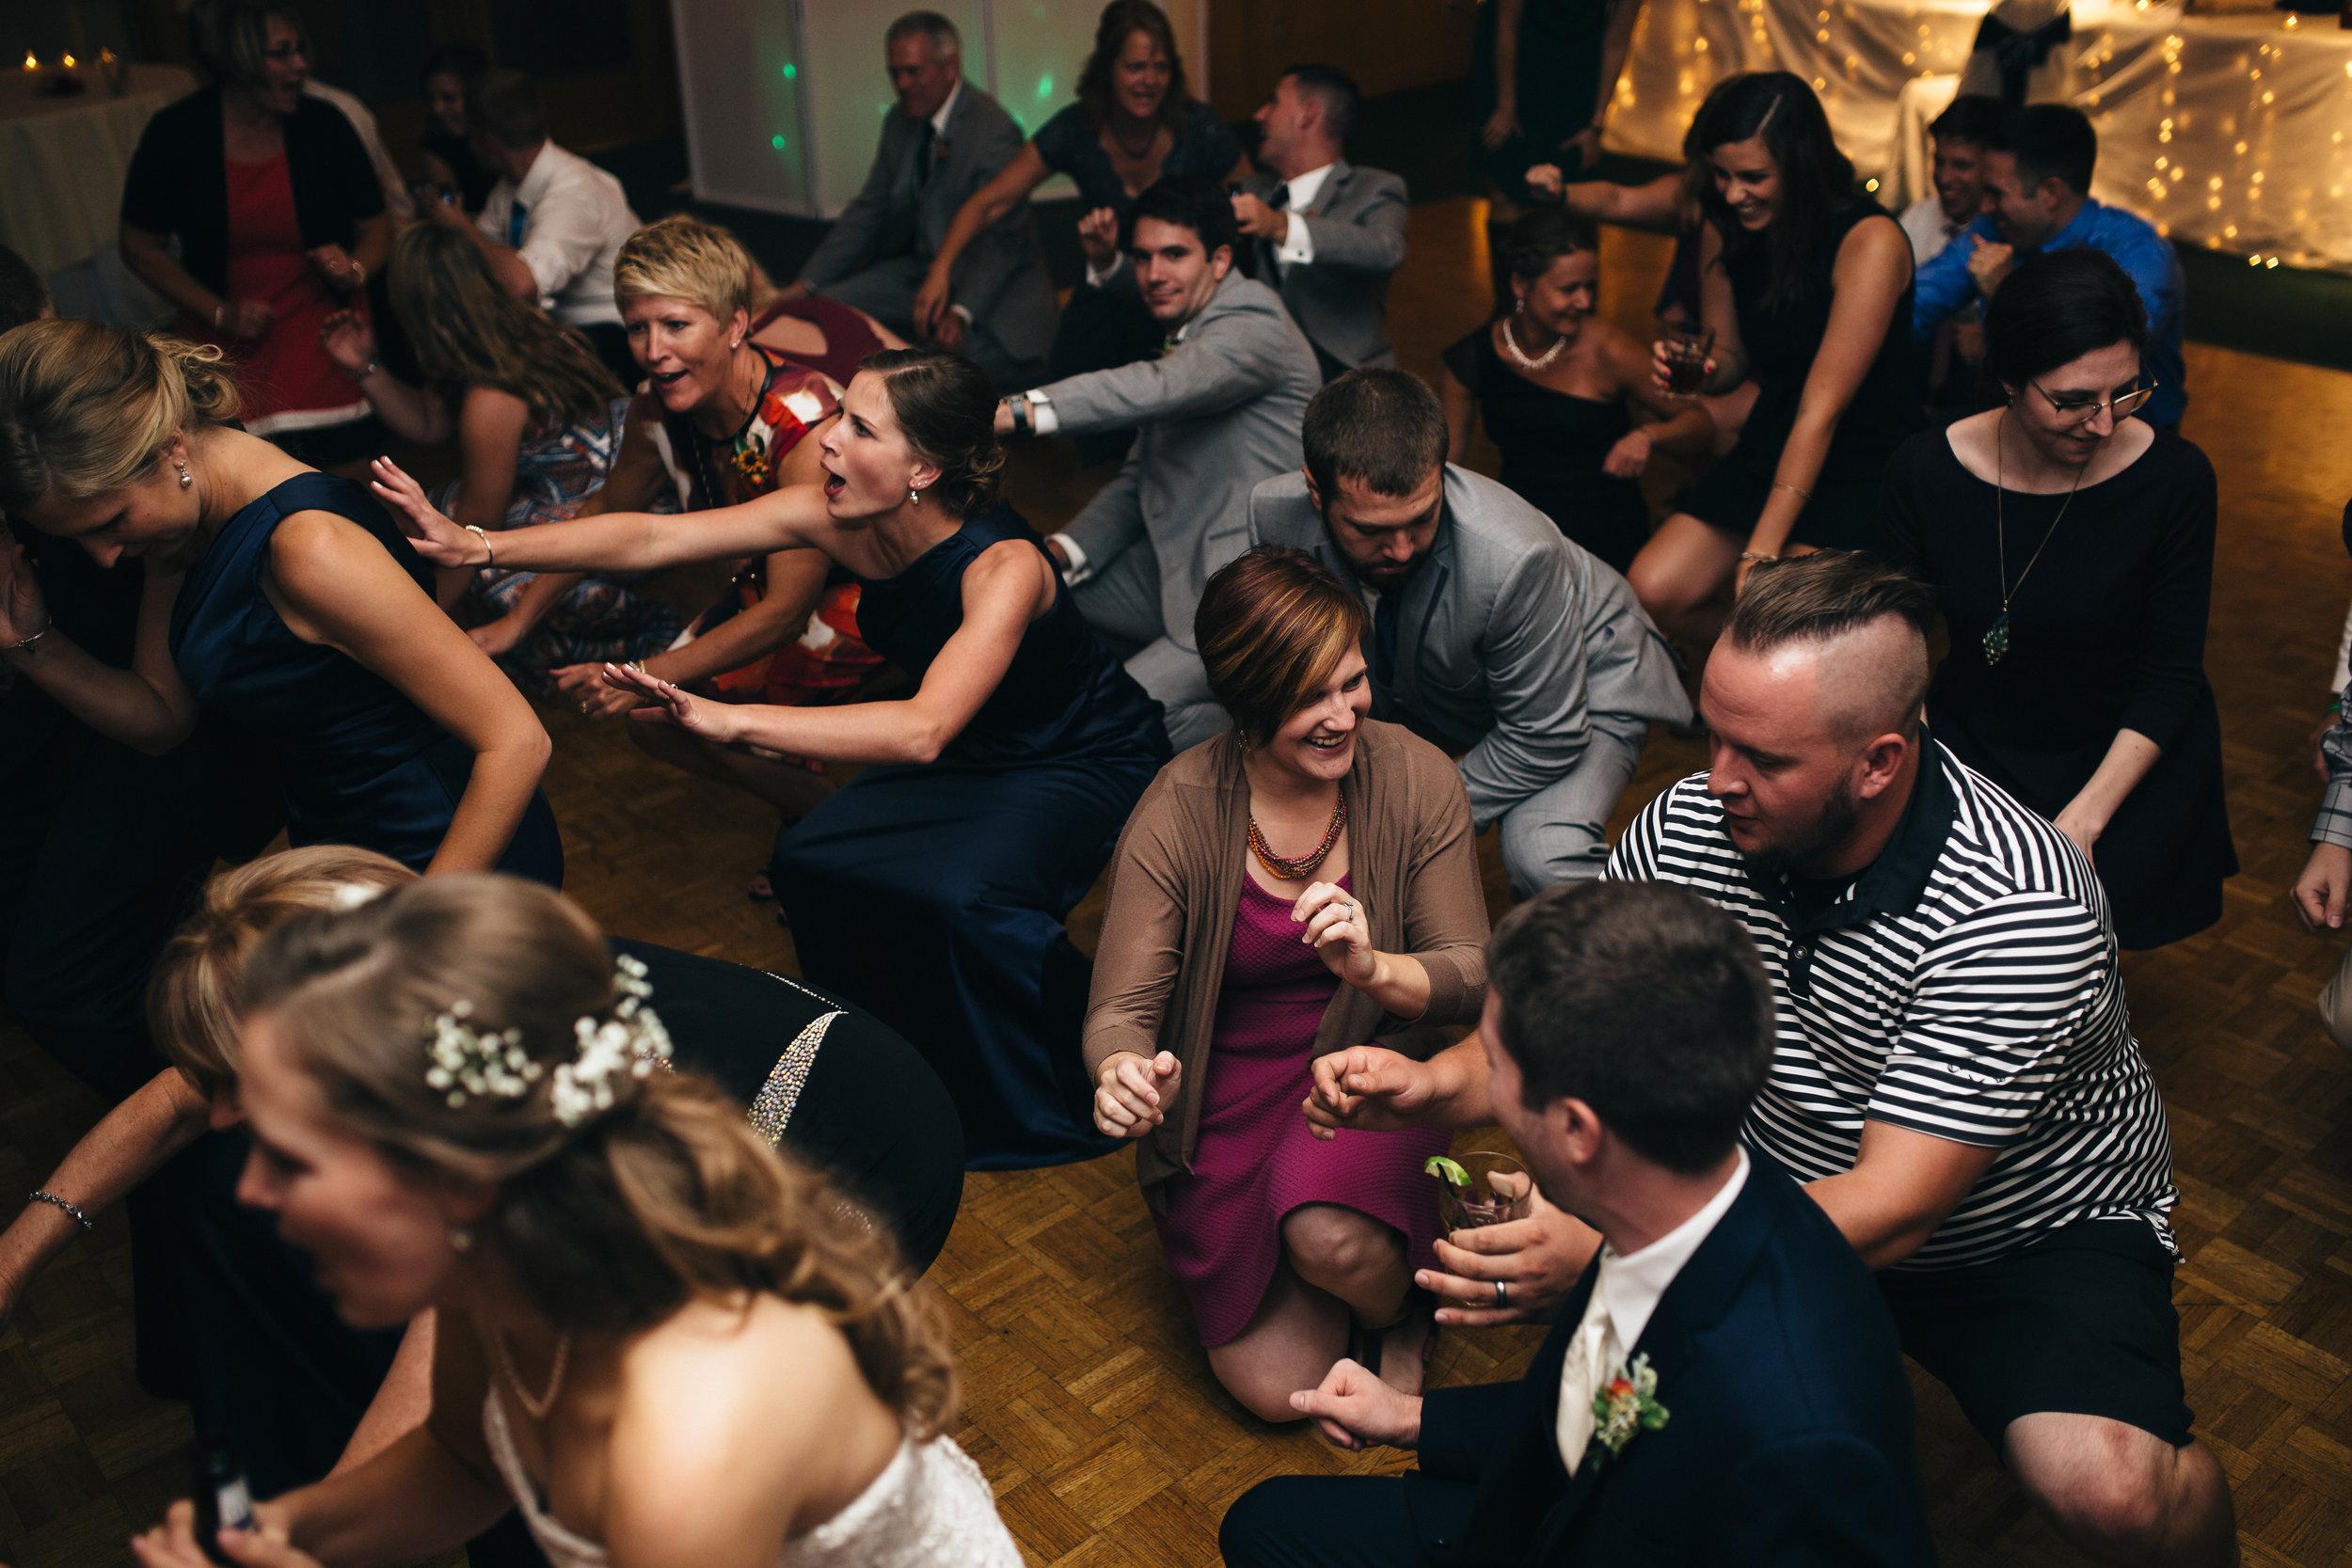 BookthatDJ.com plays at Wedding Reception in Bowling Green, Ohio.